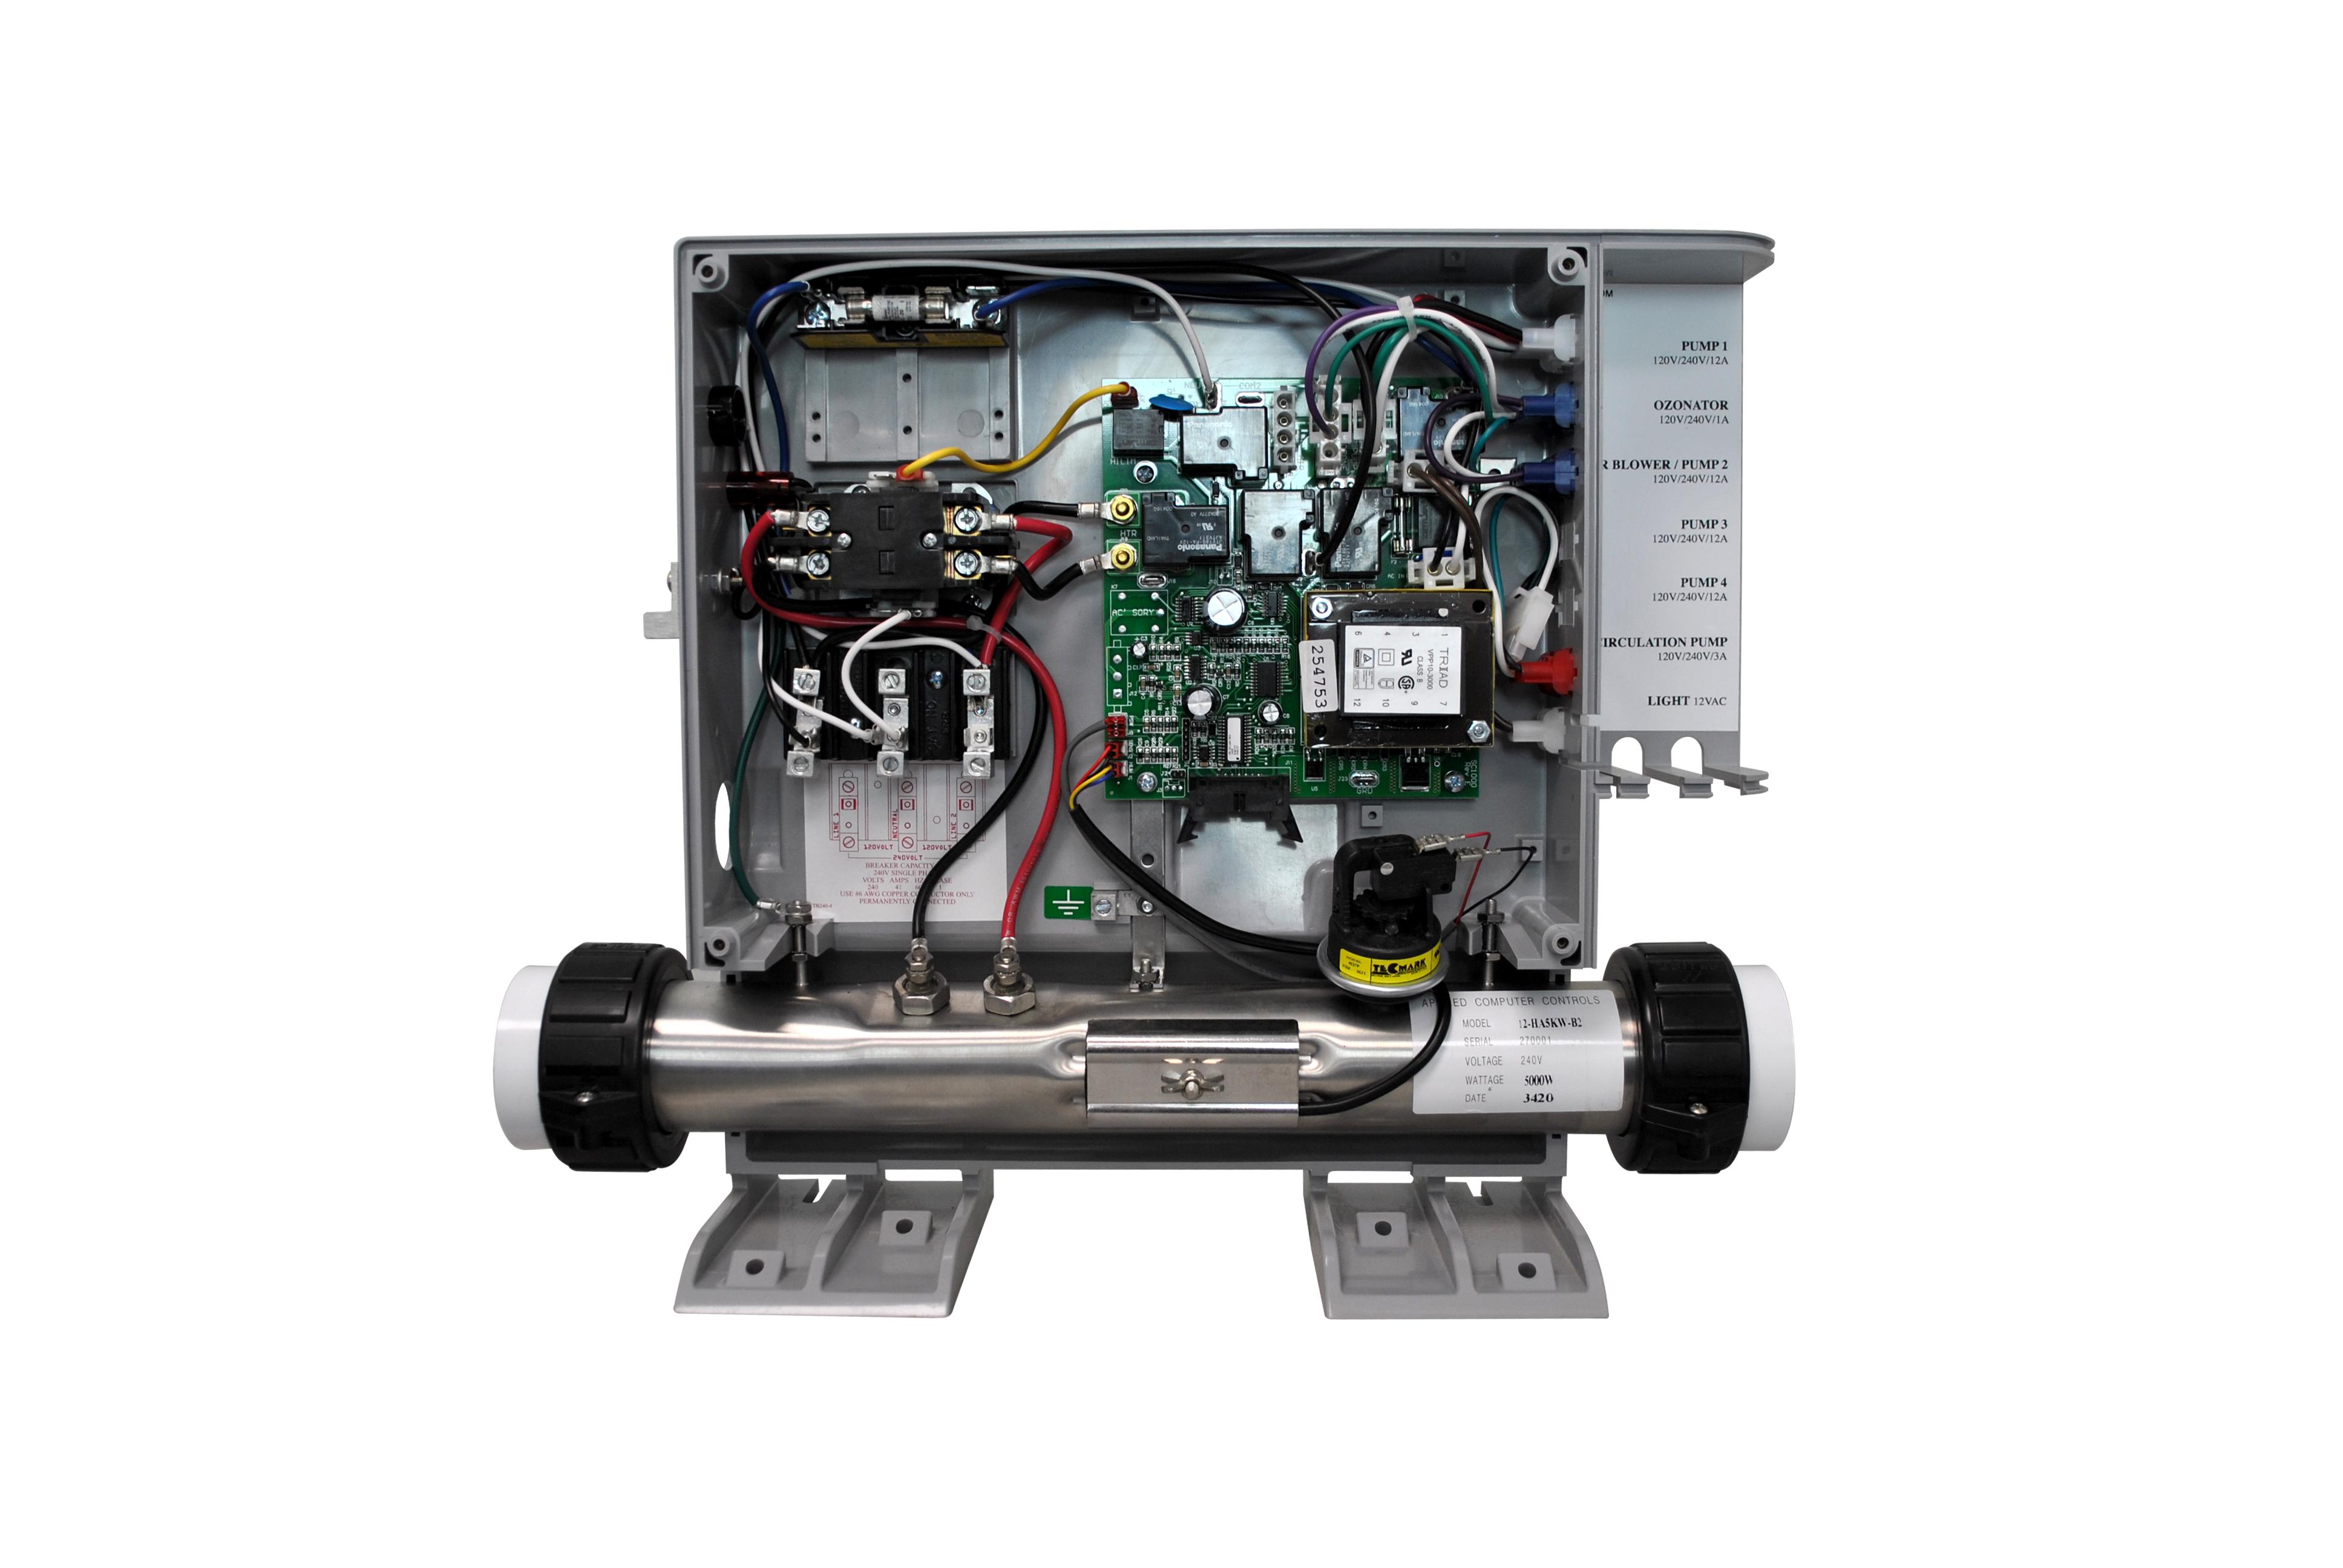 ACC Hot Tub Heater Internals